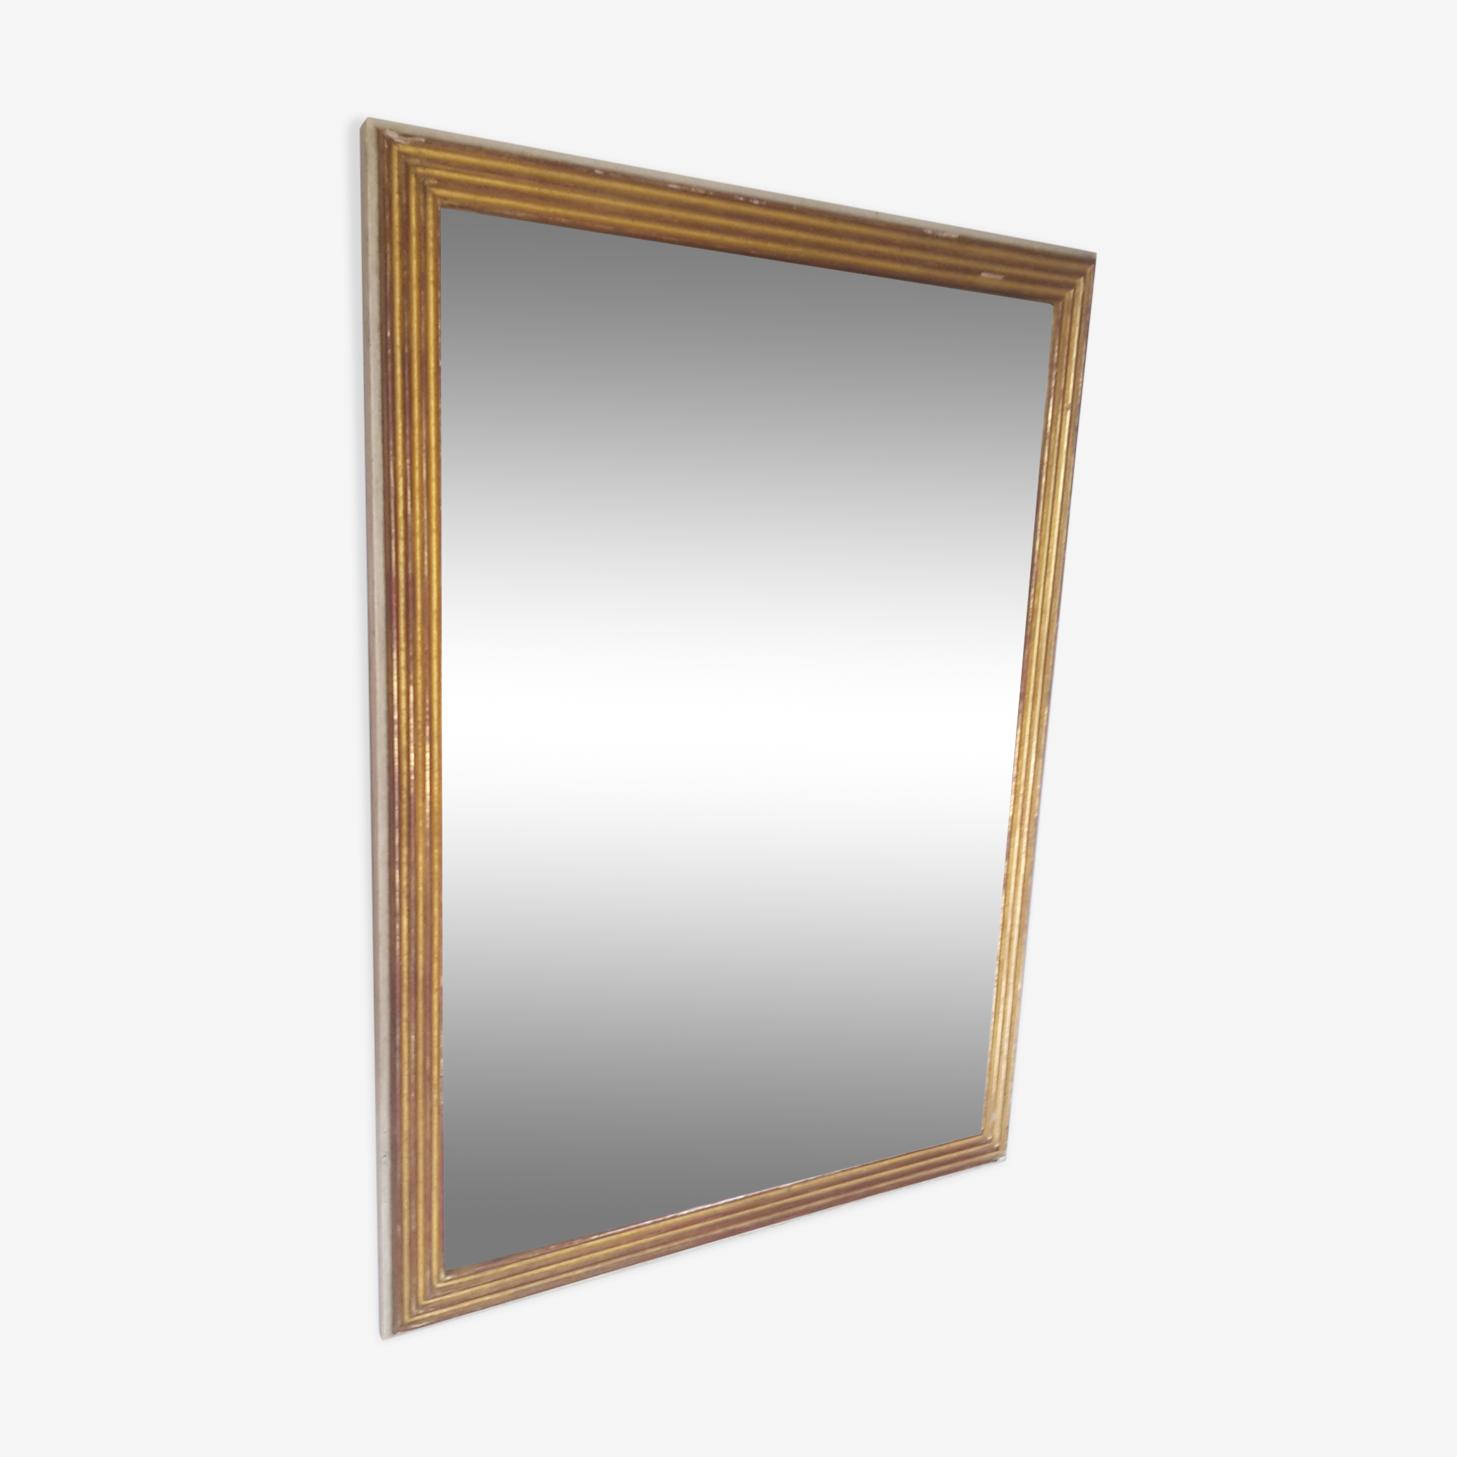 Miroir patiné style Louis XVI 63x84cm